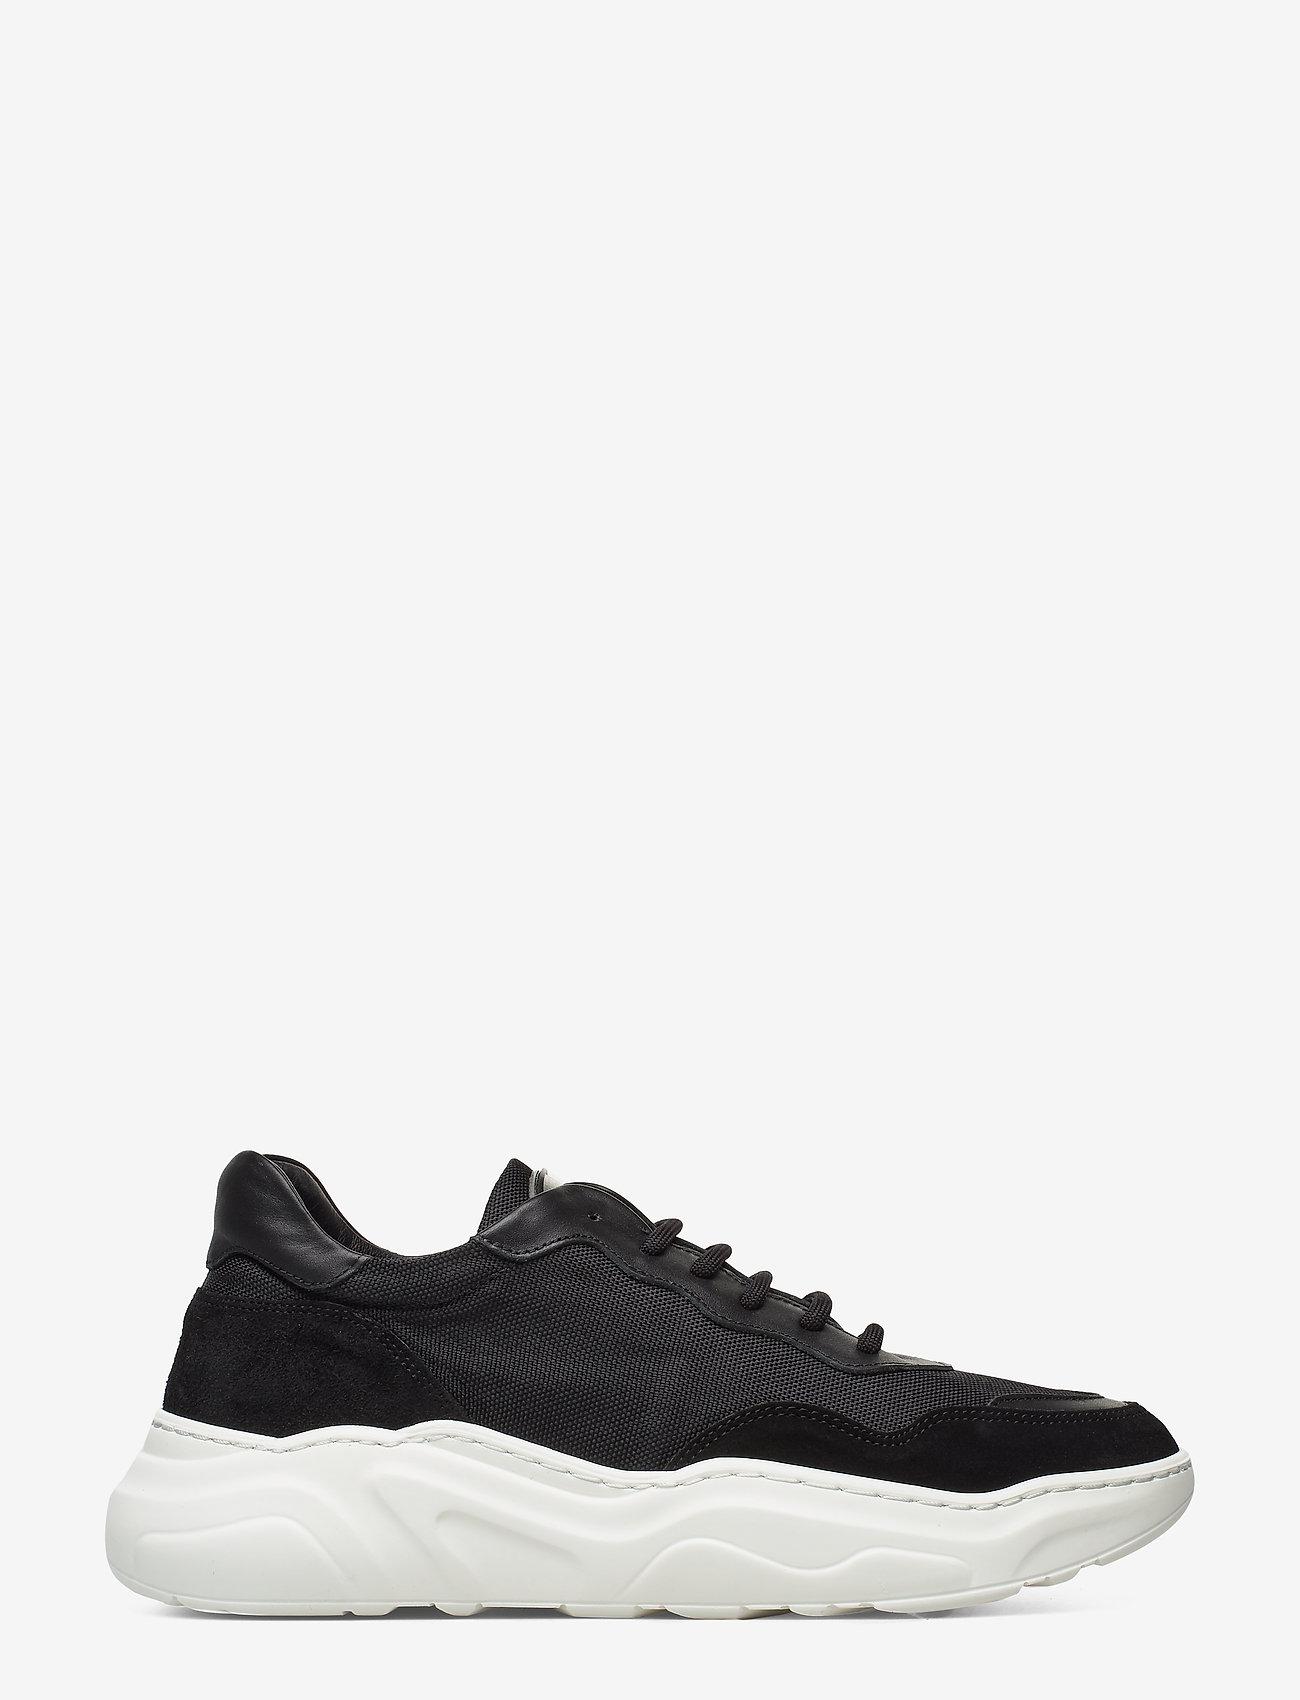 Black Winner  Jim Rickey  Sneakers - Sko Til Dame